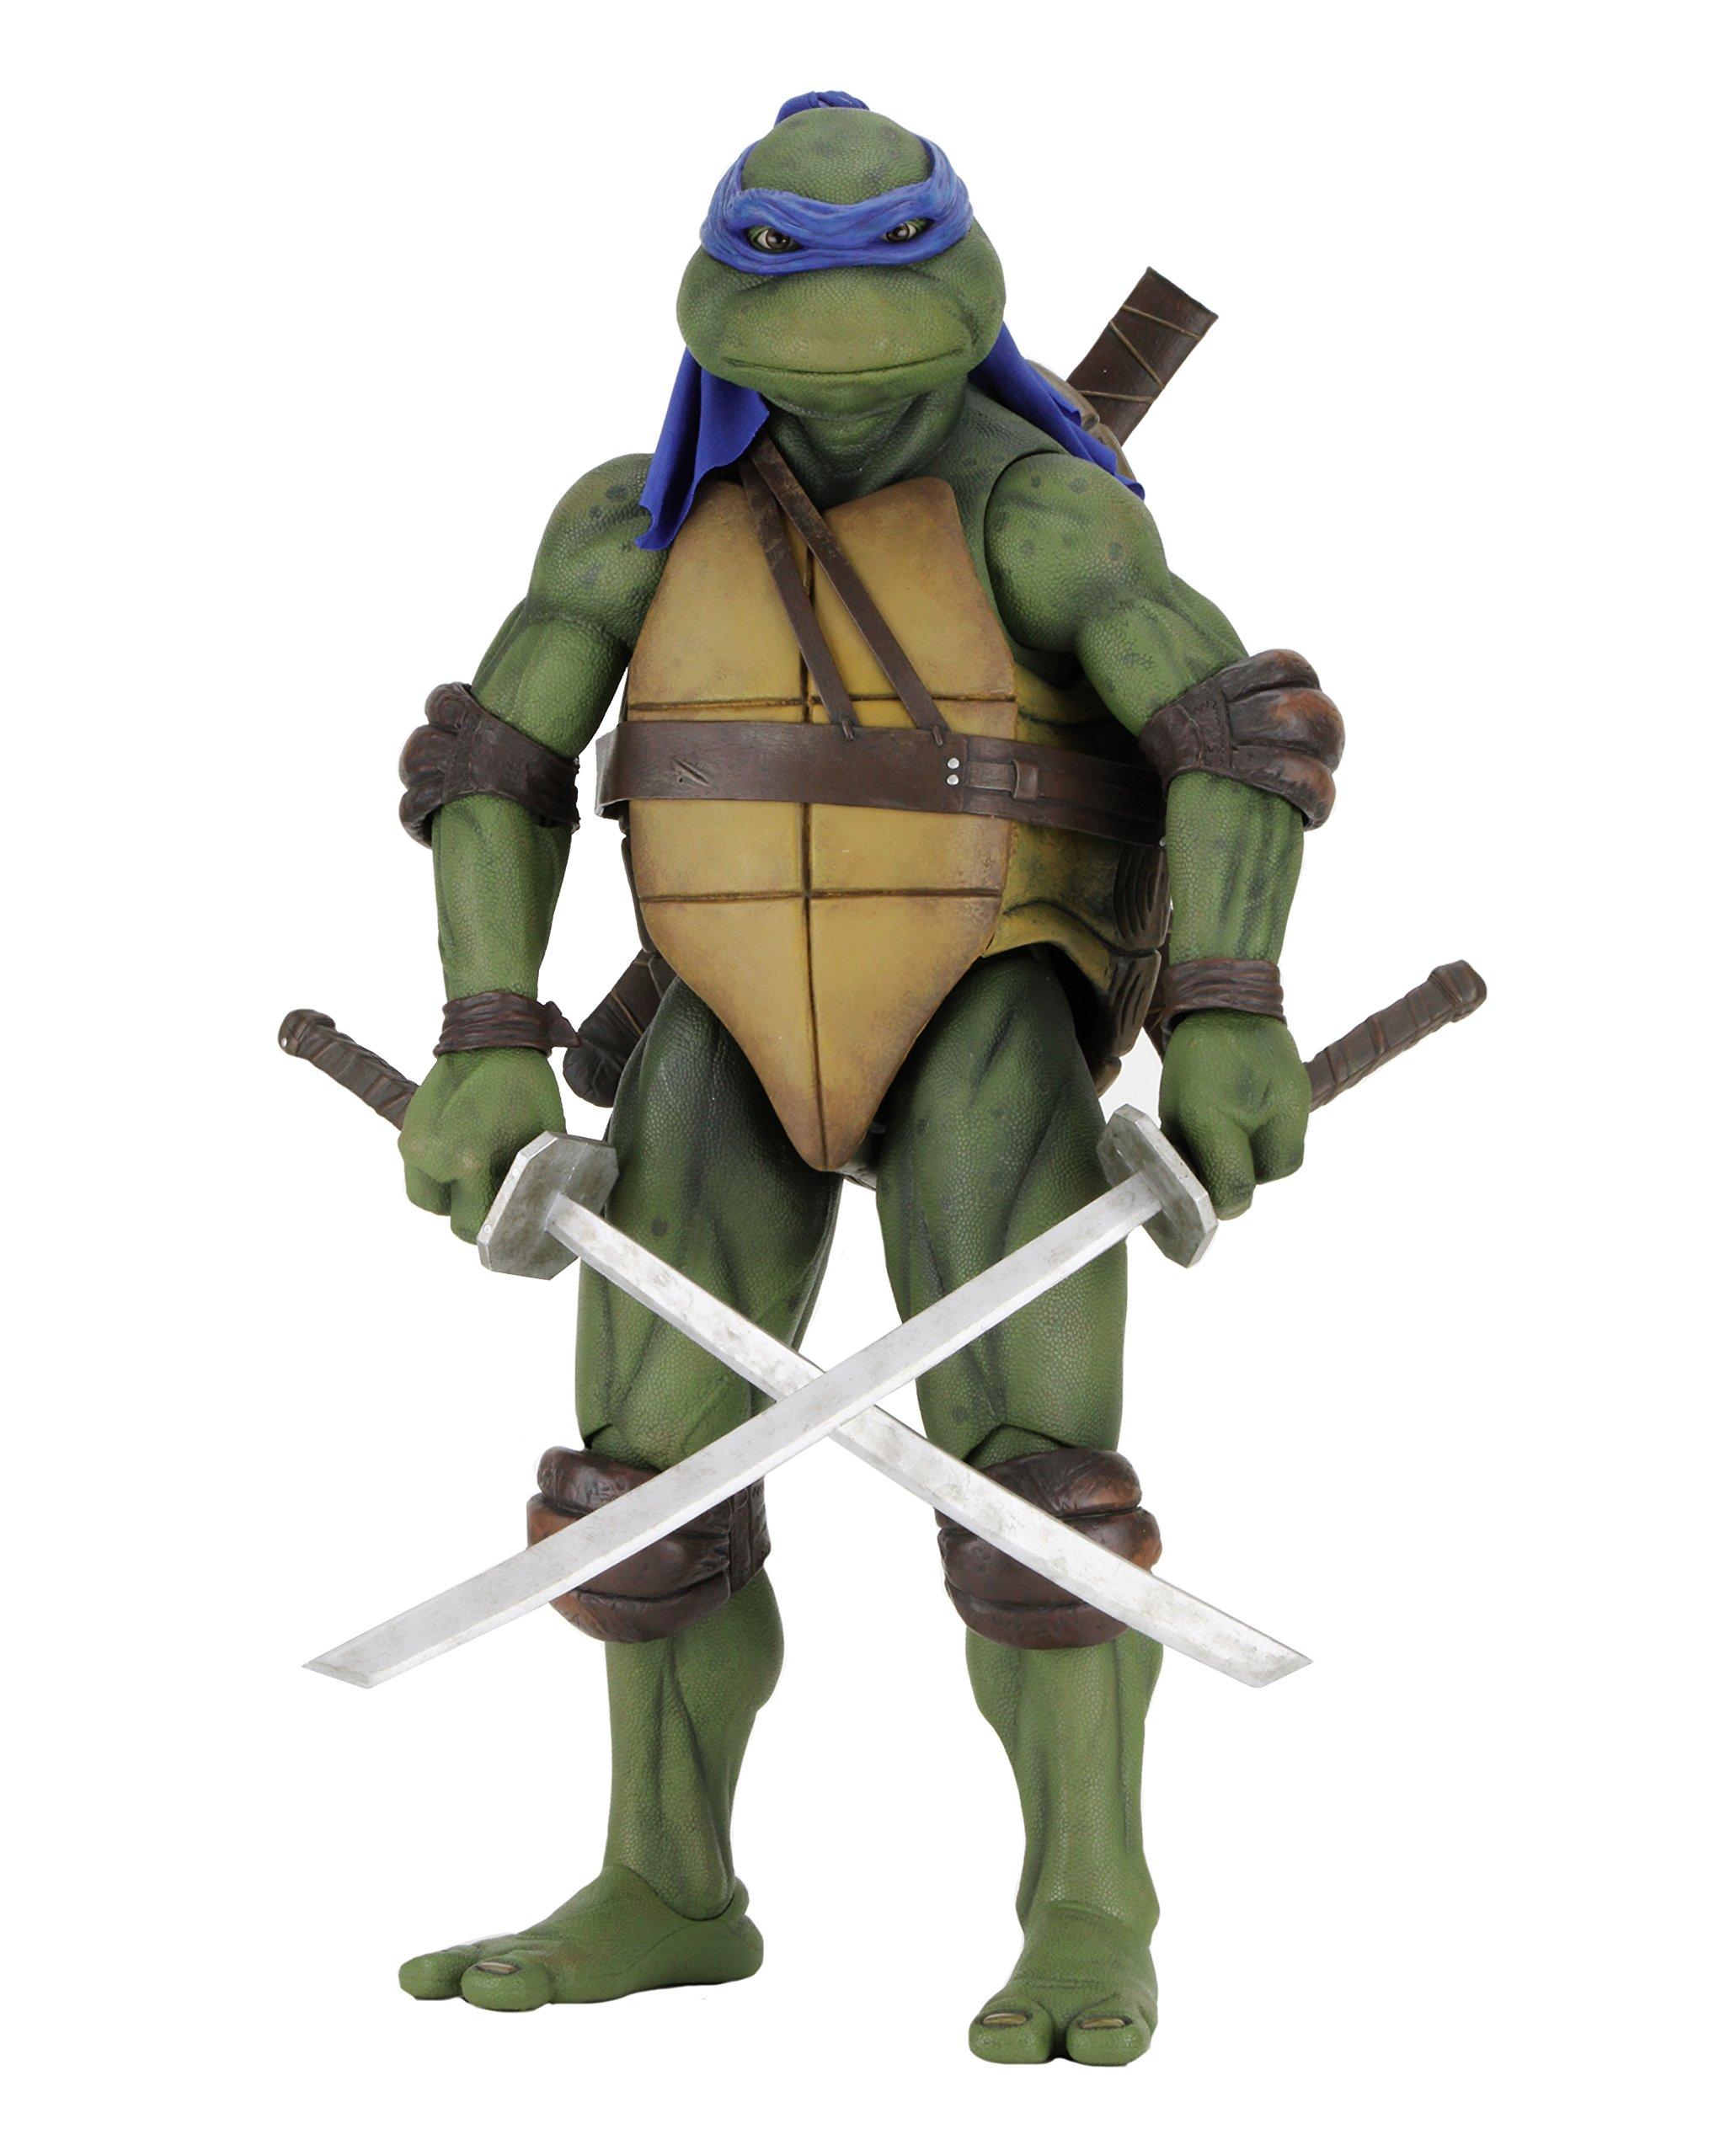 NECA Teenage Mutant Ninja Turtles Leonardo 1/4 Scale Action Figure by NECA (Image #1)